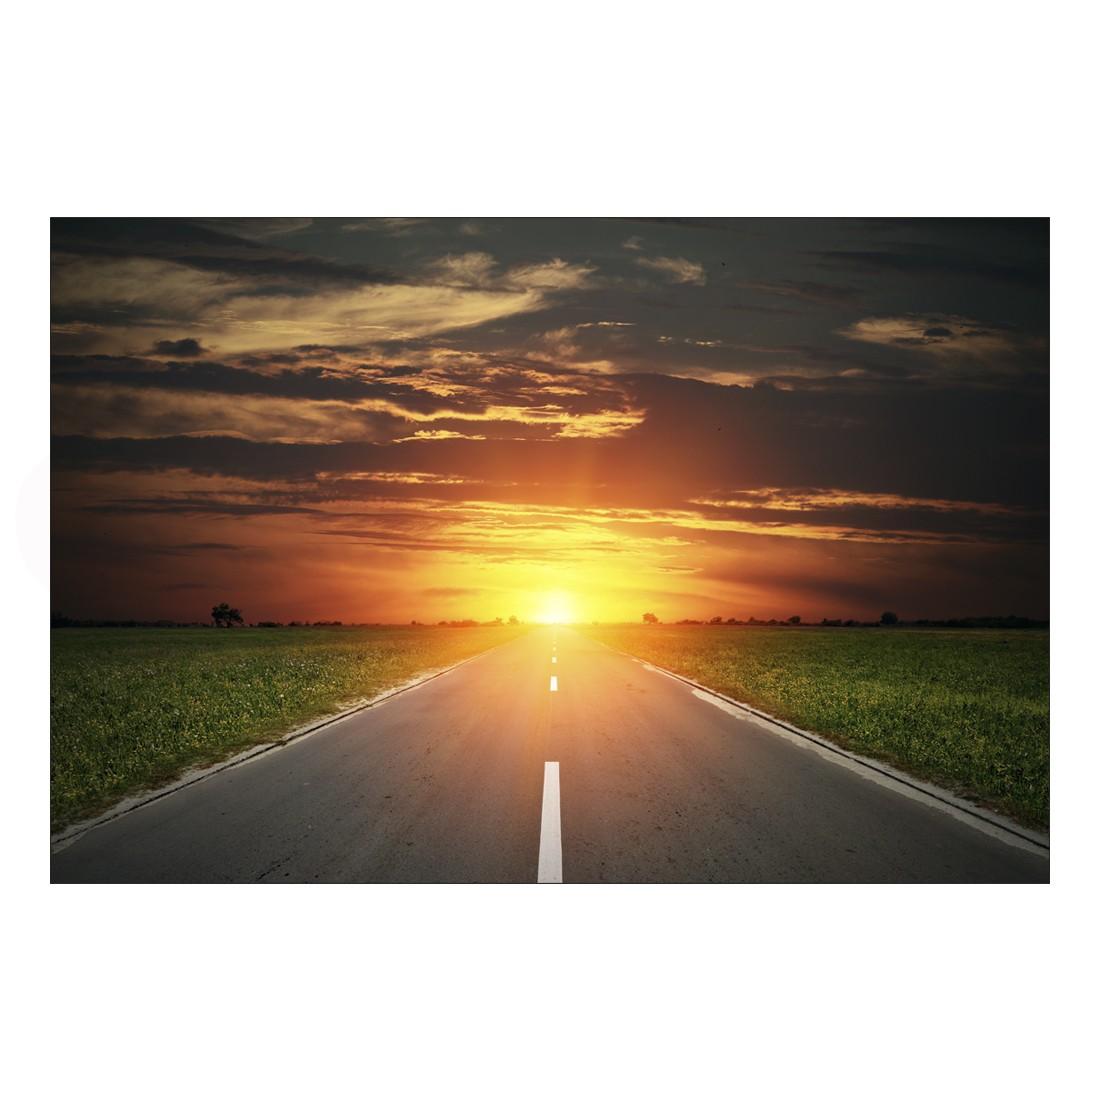 Acrylglasbild Road to Horizont – Abmessung 60×40 cm, Gallery of Innovative Art kaufen